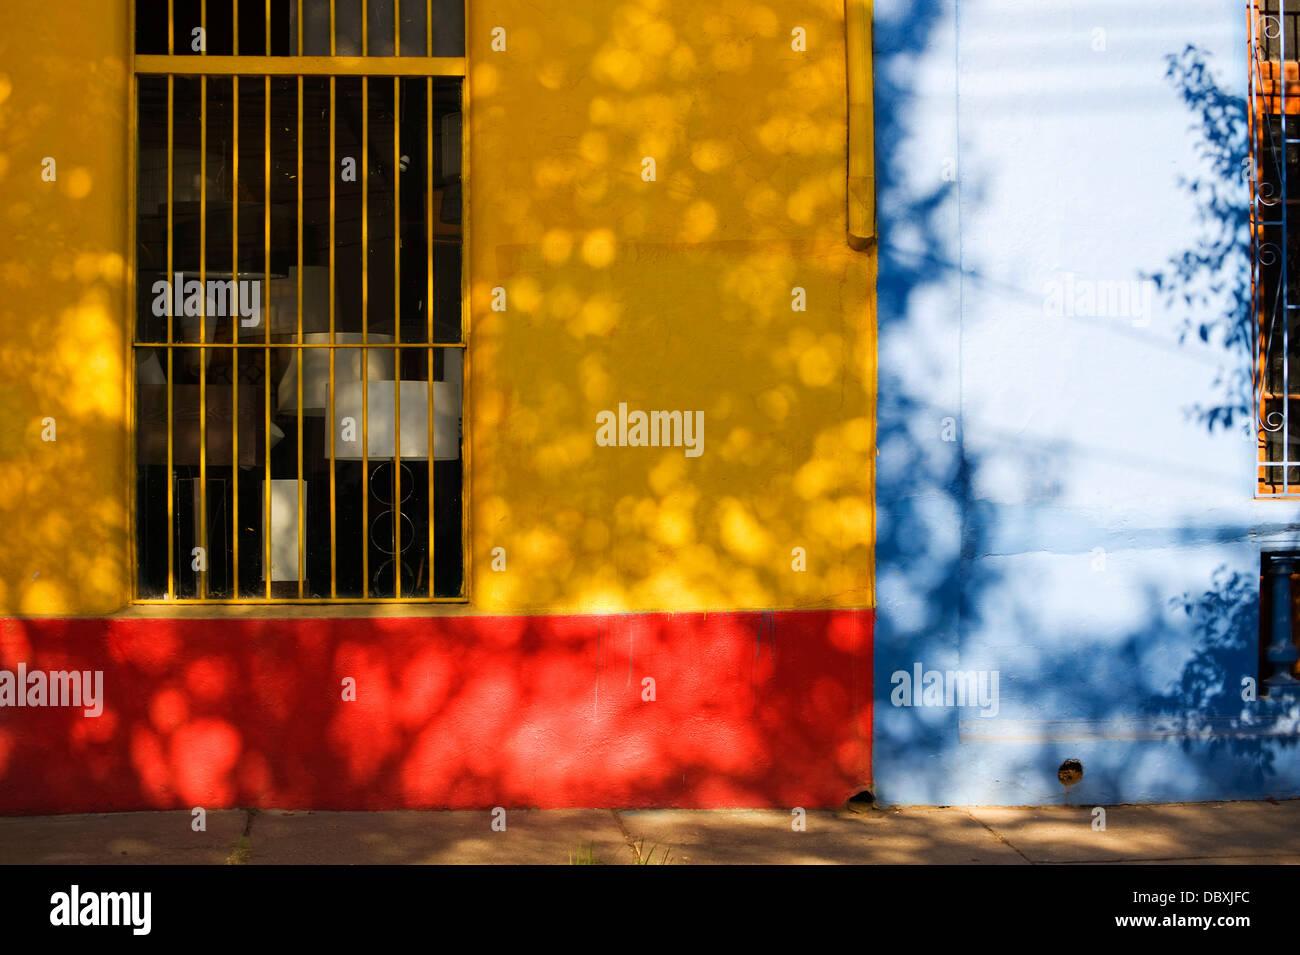 Barrio Bellavista, Santiago Chile - Stock Image